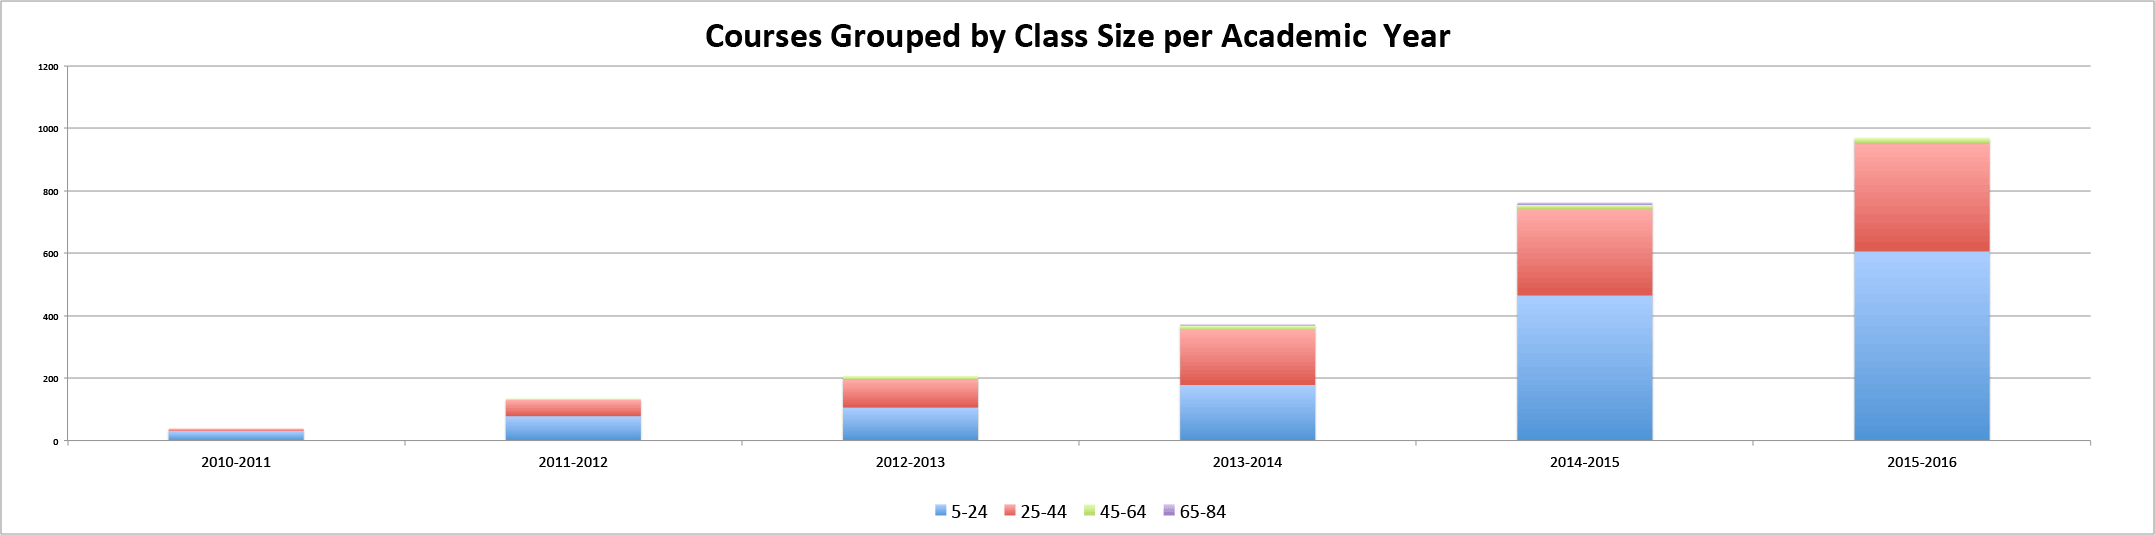 class-sizes